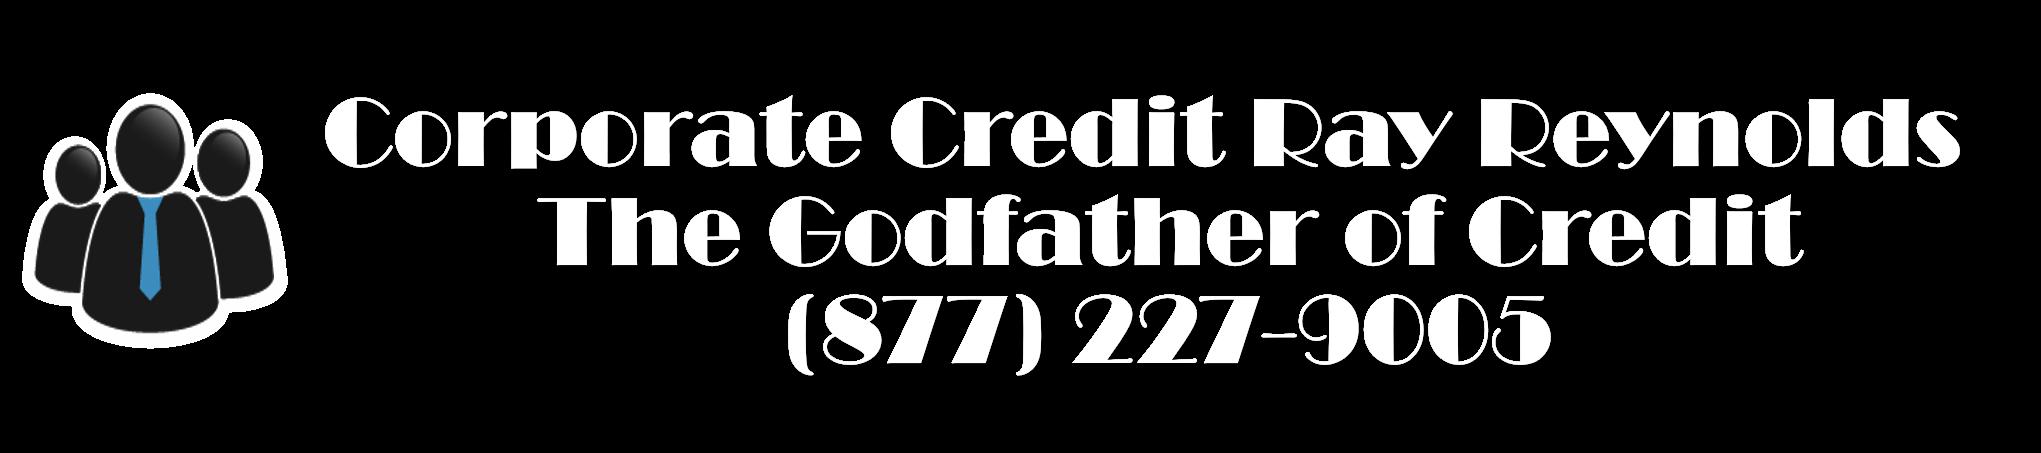 Corporate Credit Ray Reynolds